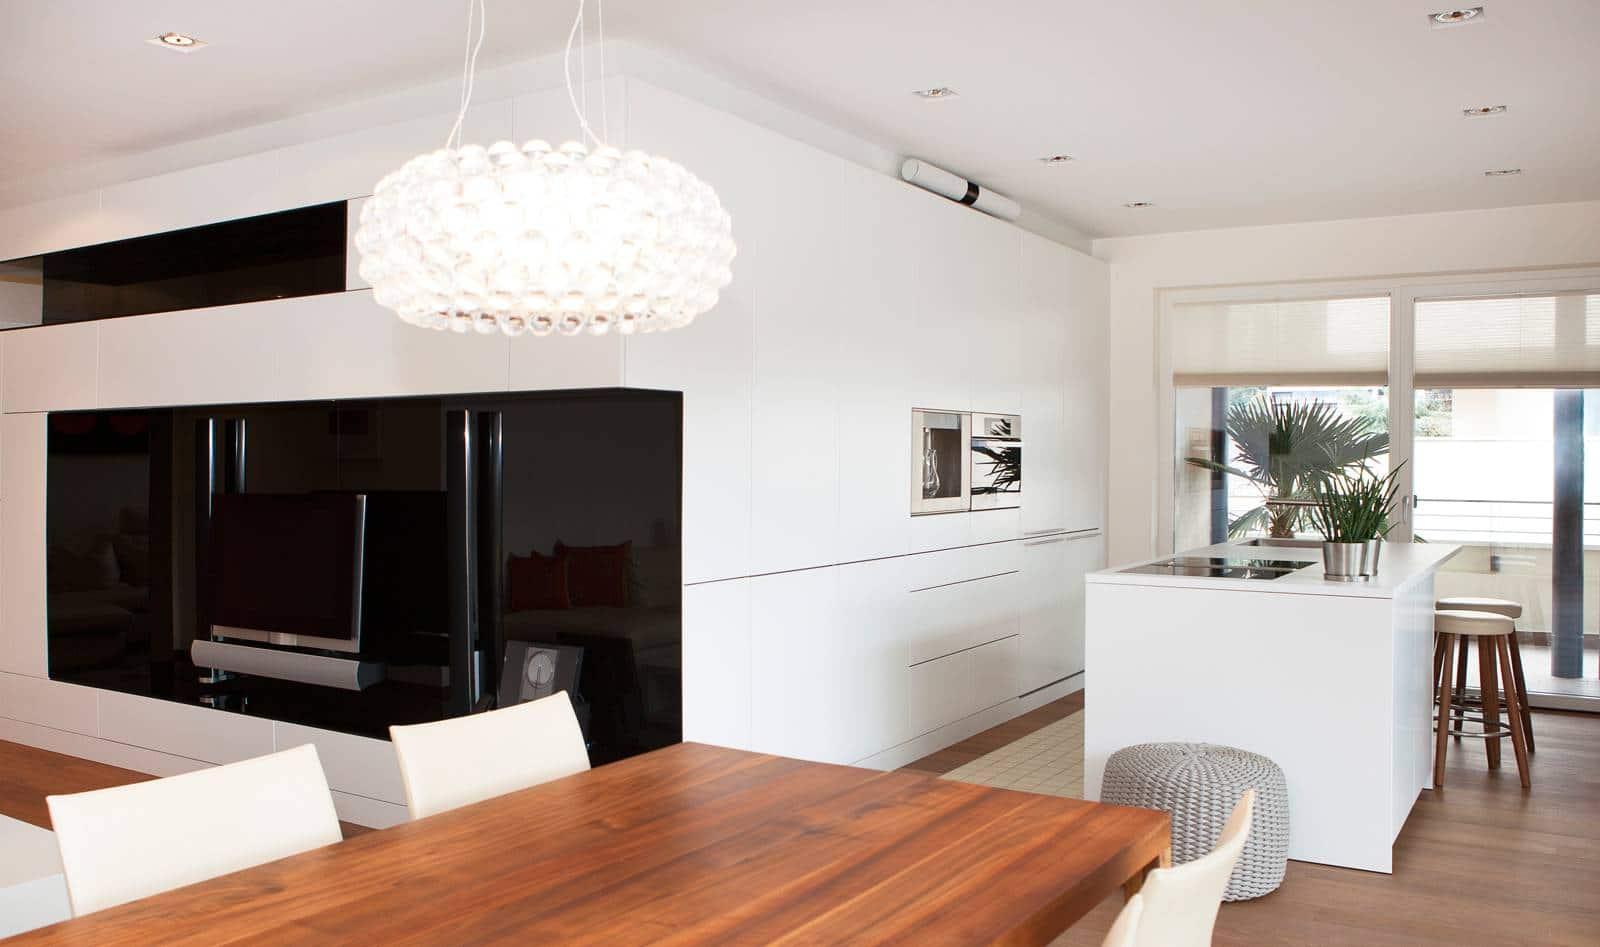 Dise o de planos de apartamento e interior construye hogar - Decoracion interiores modernos ...